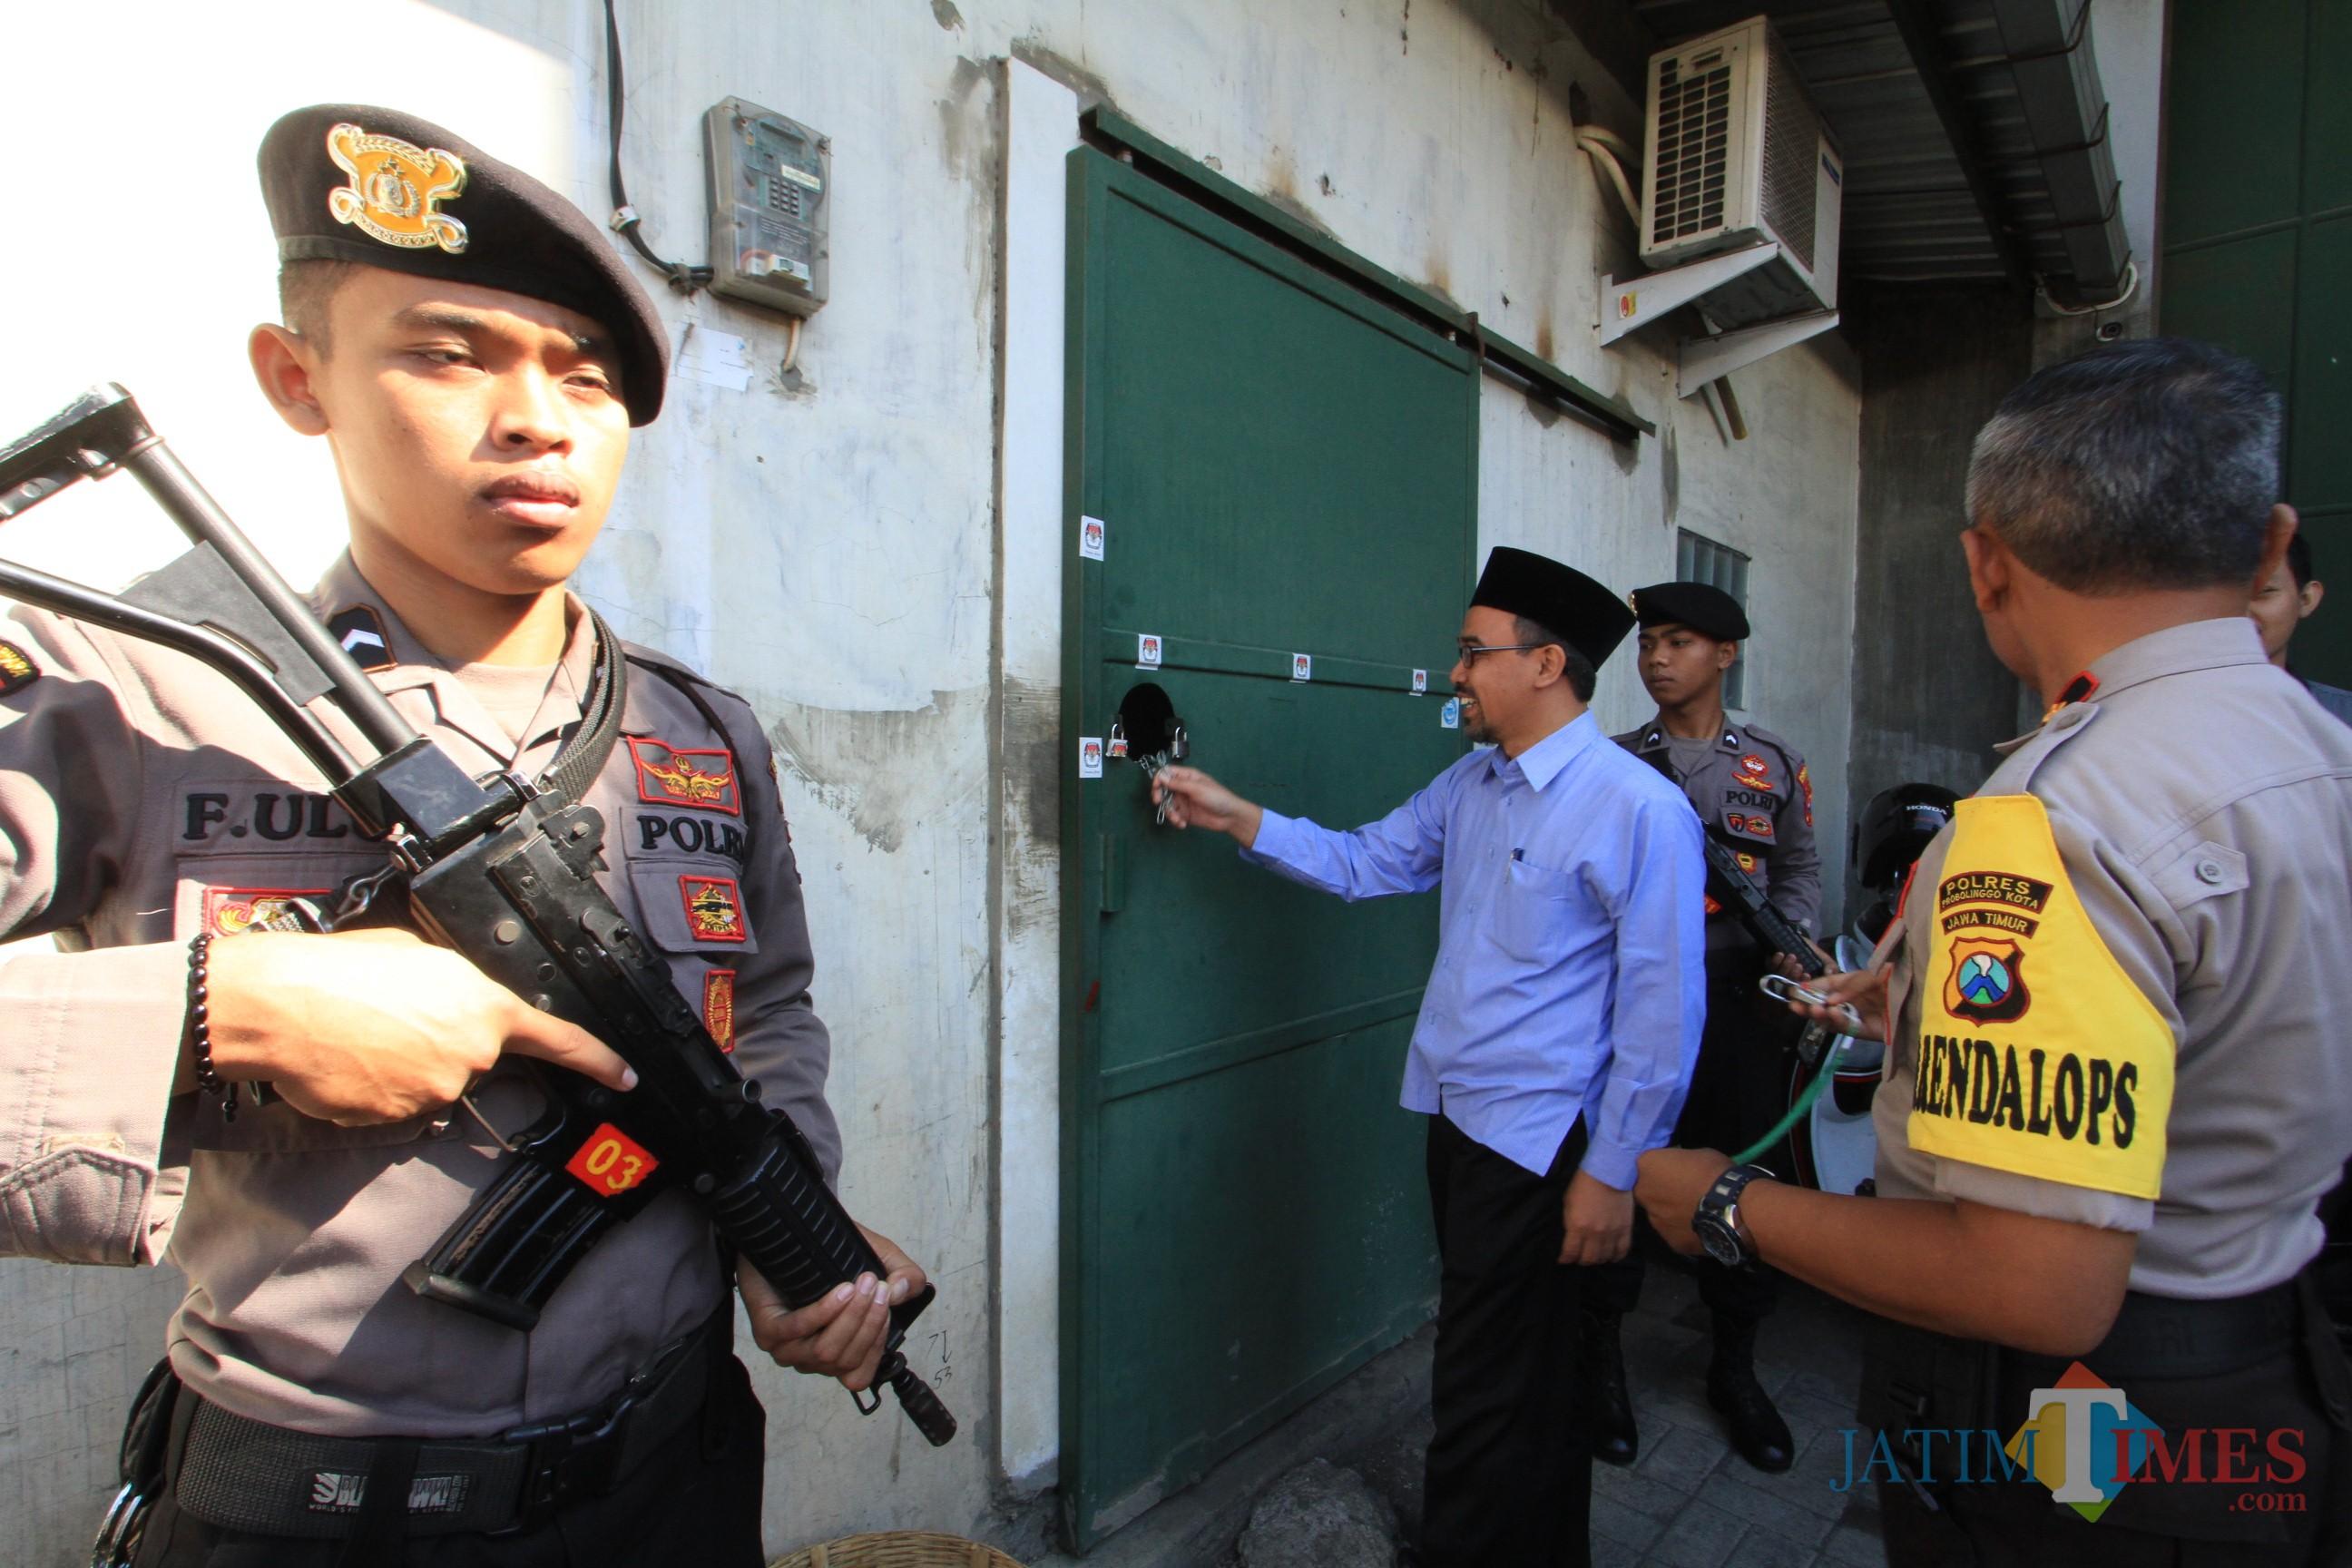 Ketua KPU Kota Probolinggo Ahmad Hudri saat membuka pintu gudang penyimpanan kotak suara(Agus Salam/Jatim TIMES)